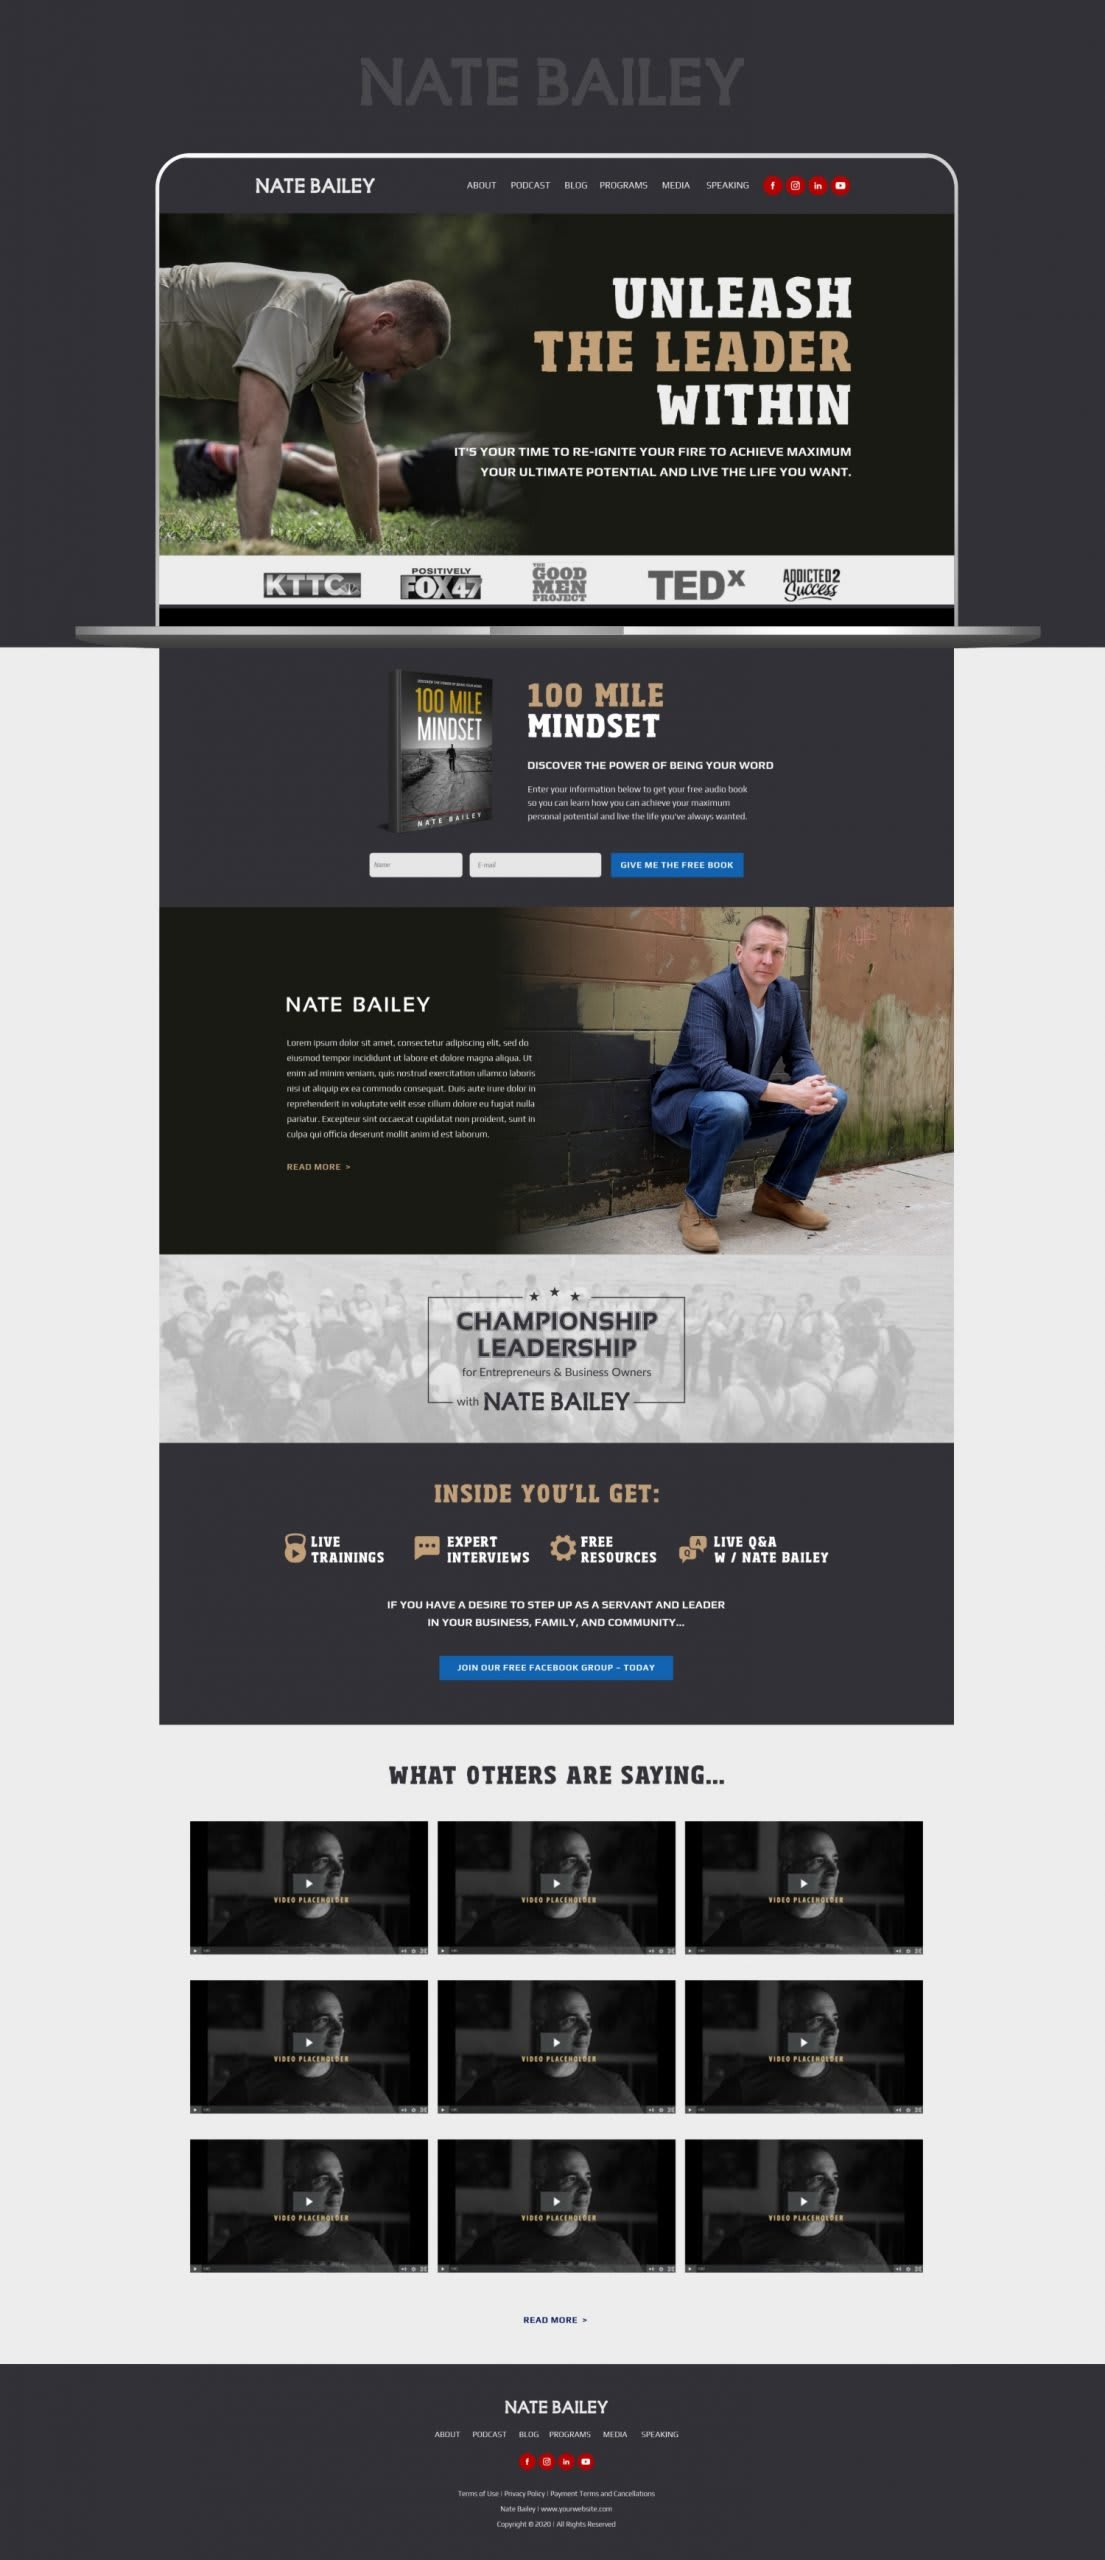 Nate-bailey-Web-mockup-1-scaled.jpg